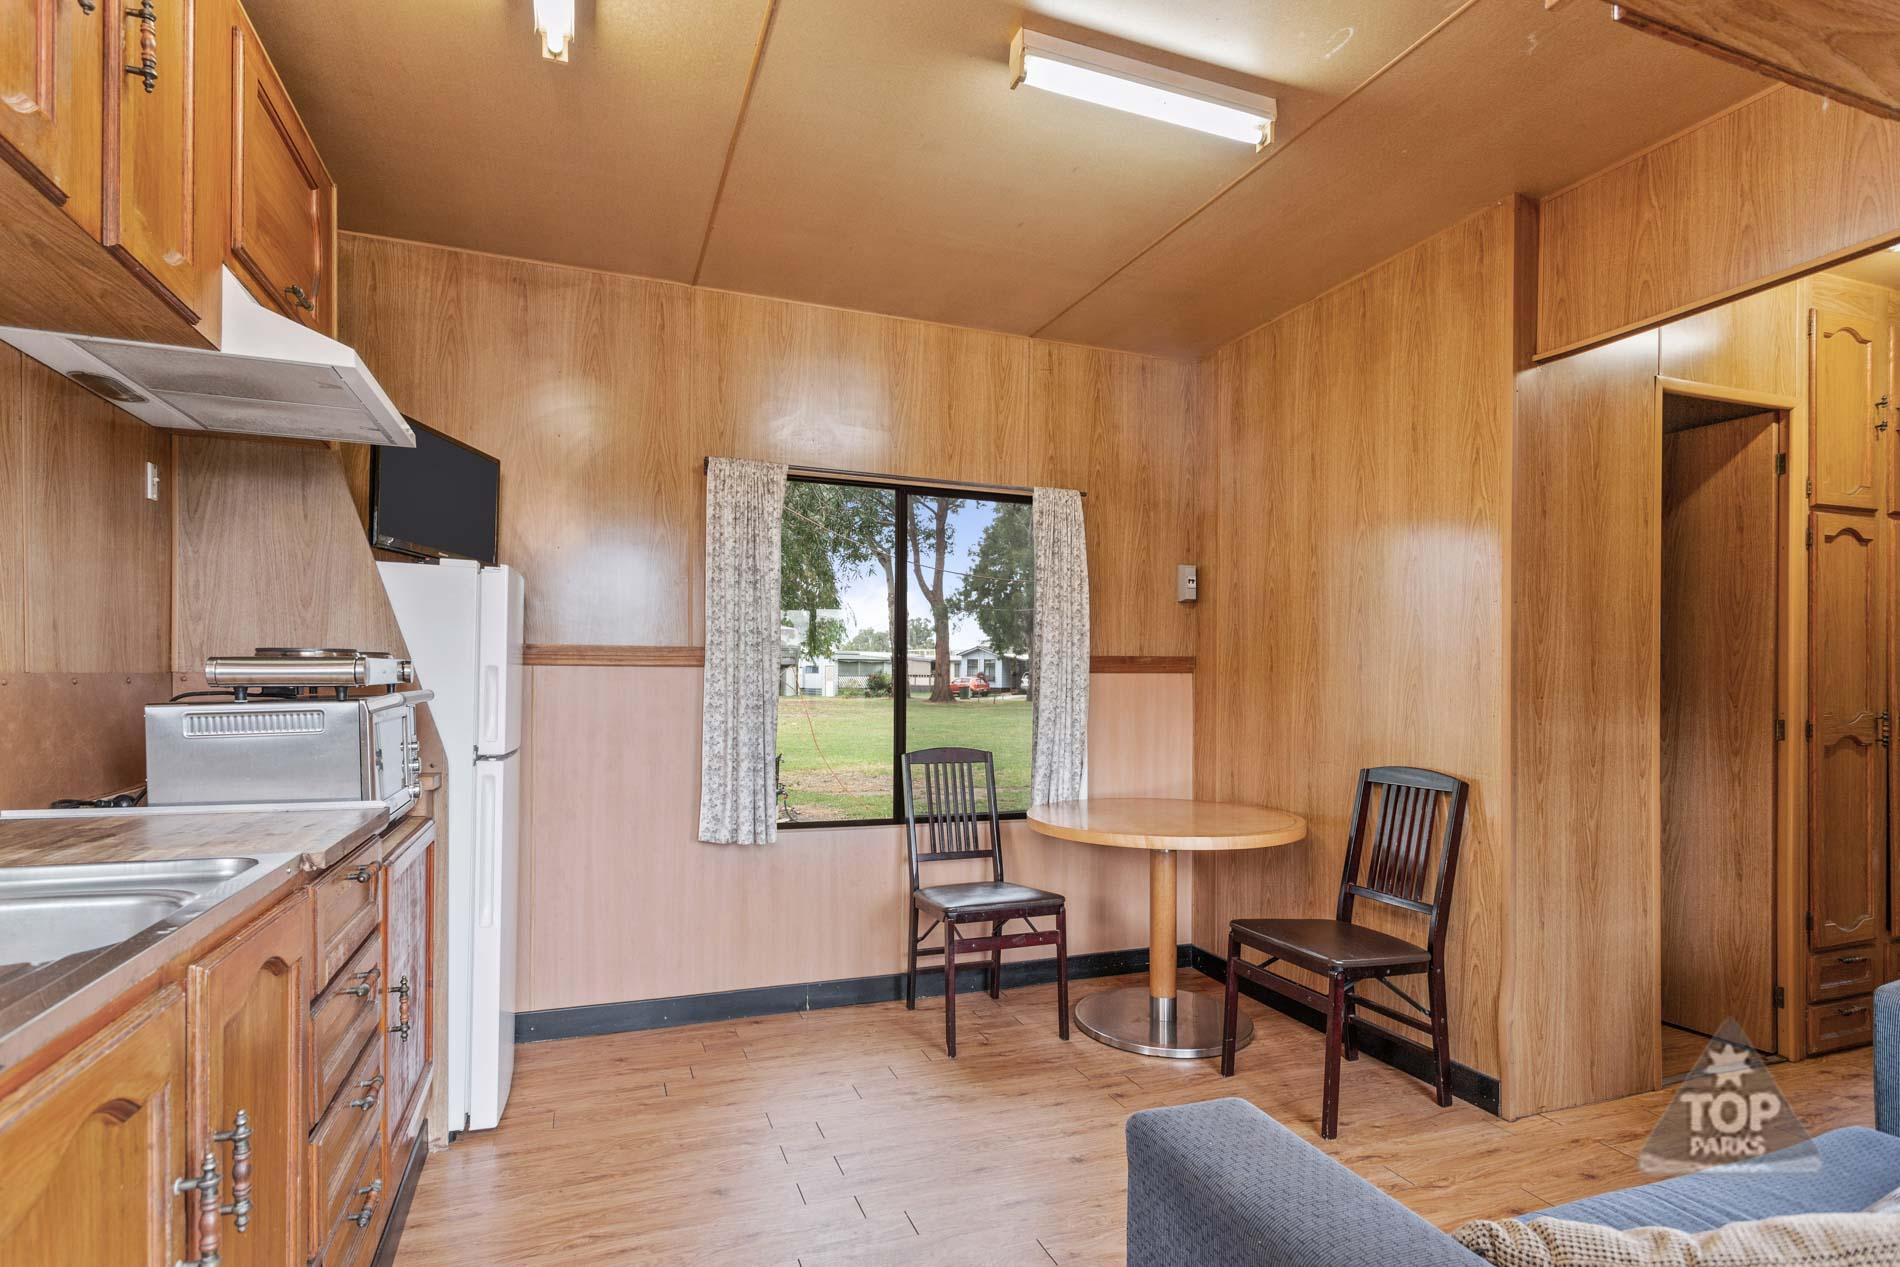 shoalhaven-caravan-village-basic-cabin-kitchen-dining